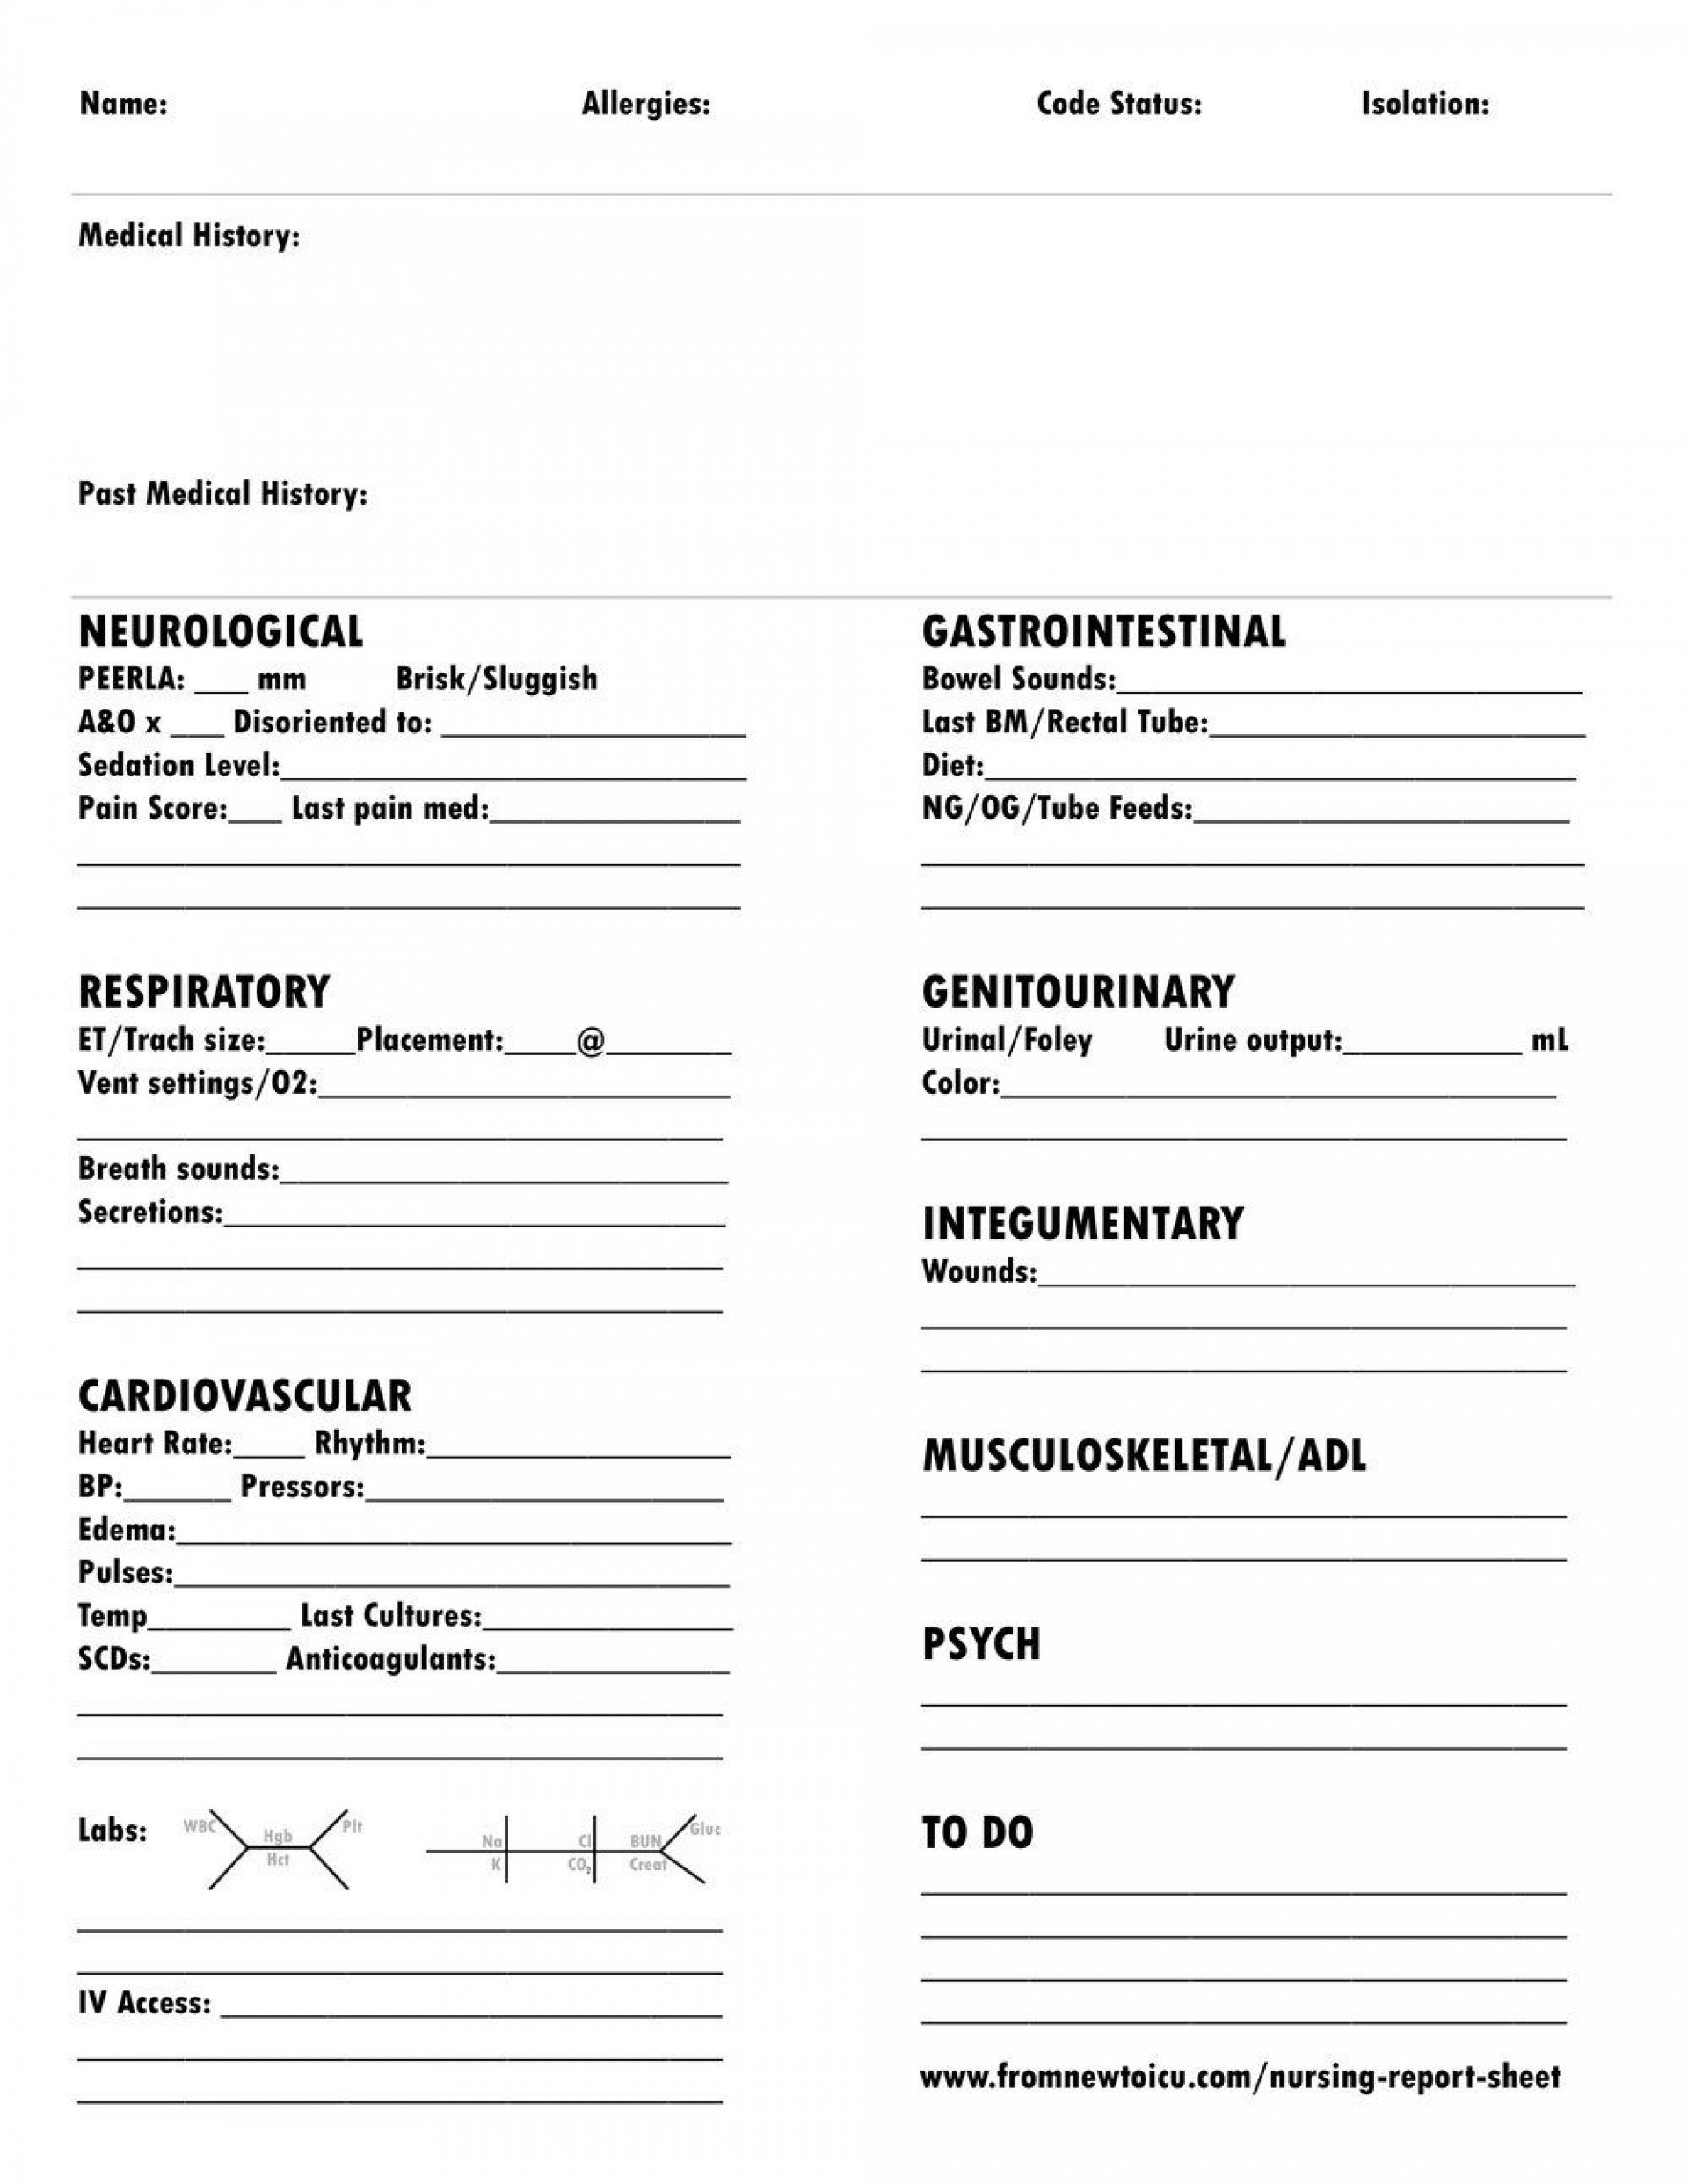 005 Archaicawful Nursing Report Sheet Template Sample  Icu Rn Printable1920